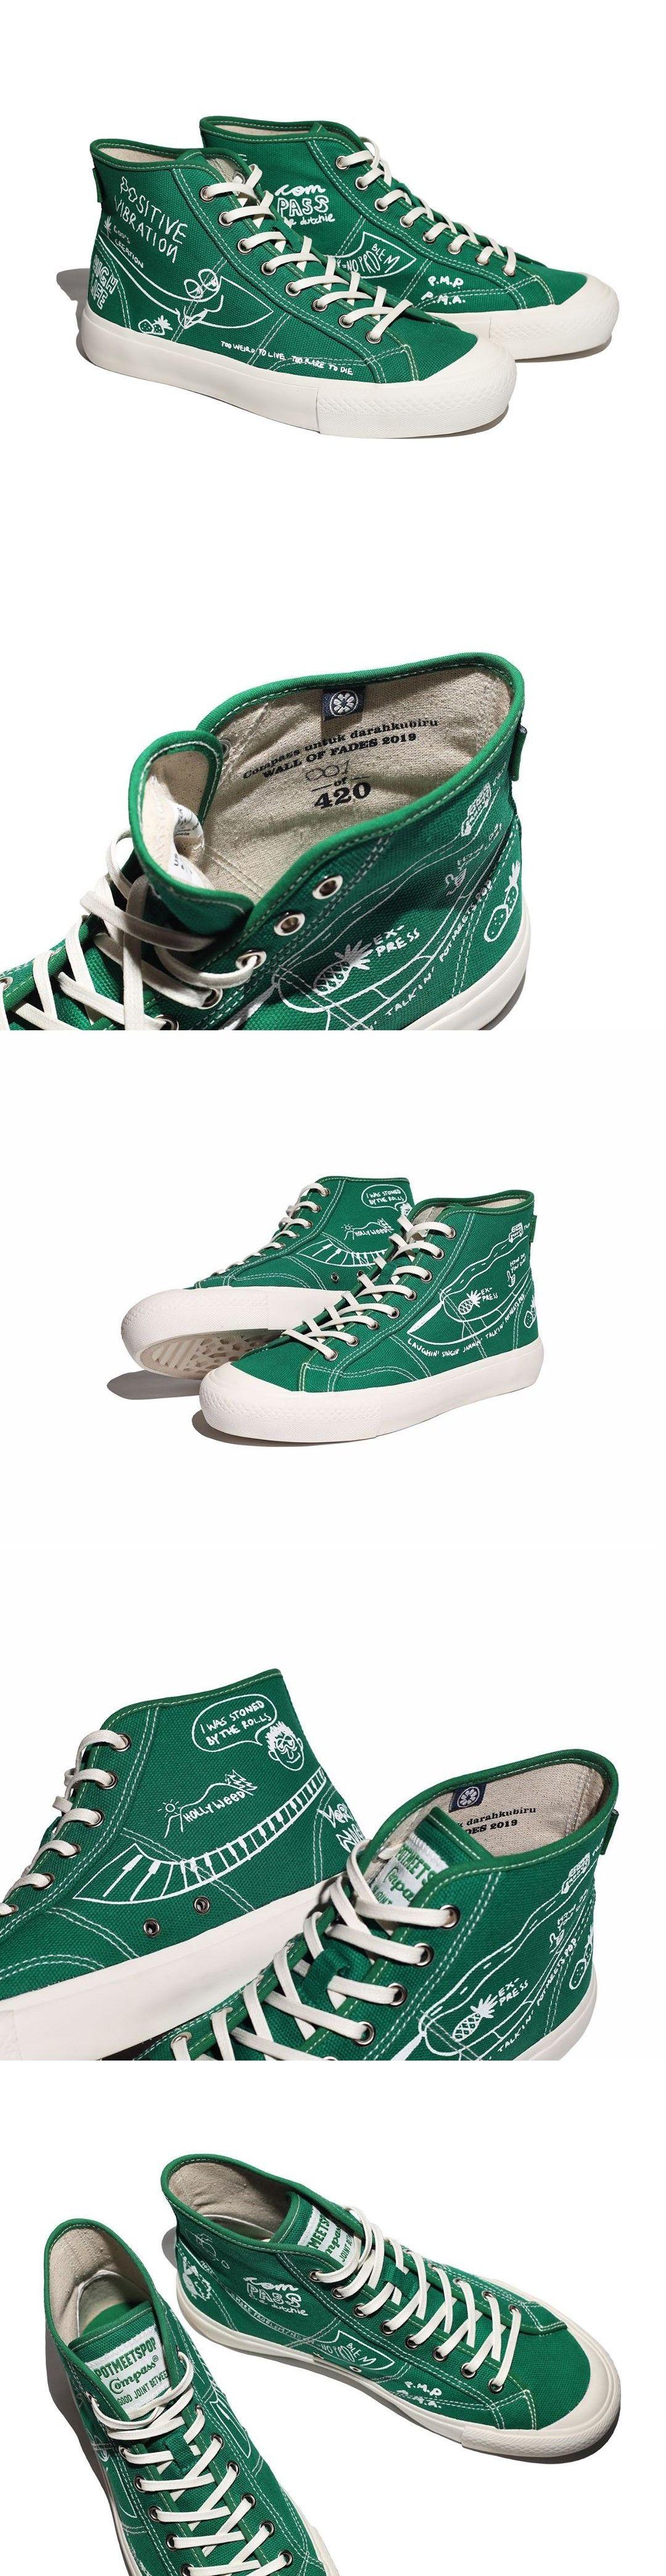 Sepatu Compass For Darahkubiru Di 2020 Sepatu Bentuk